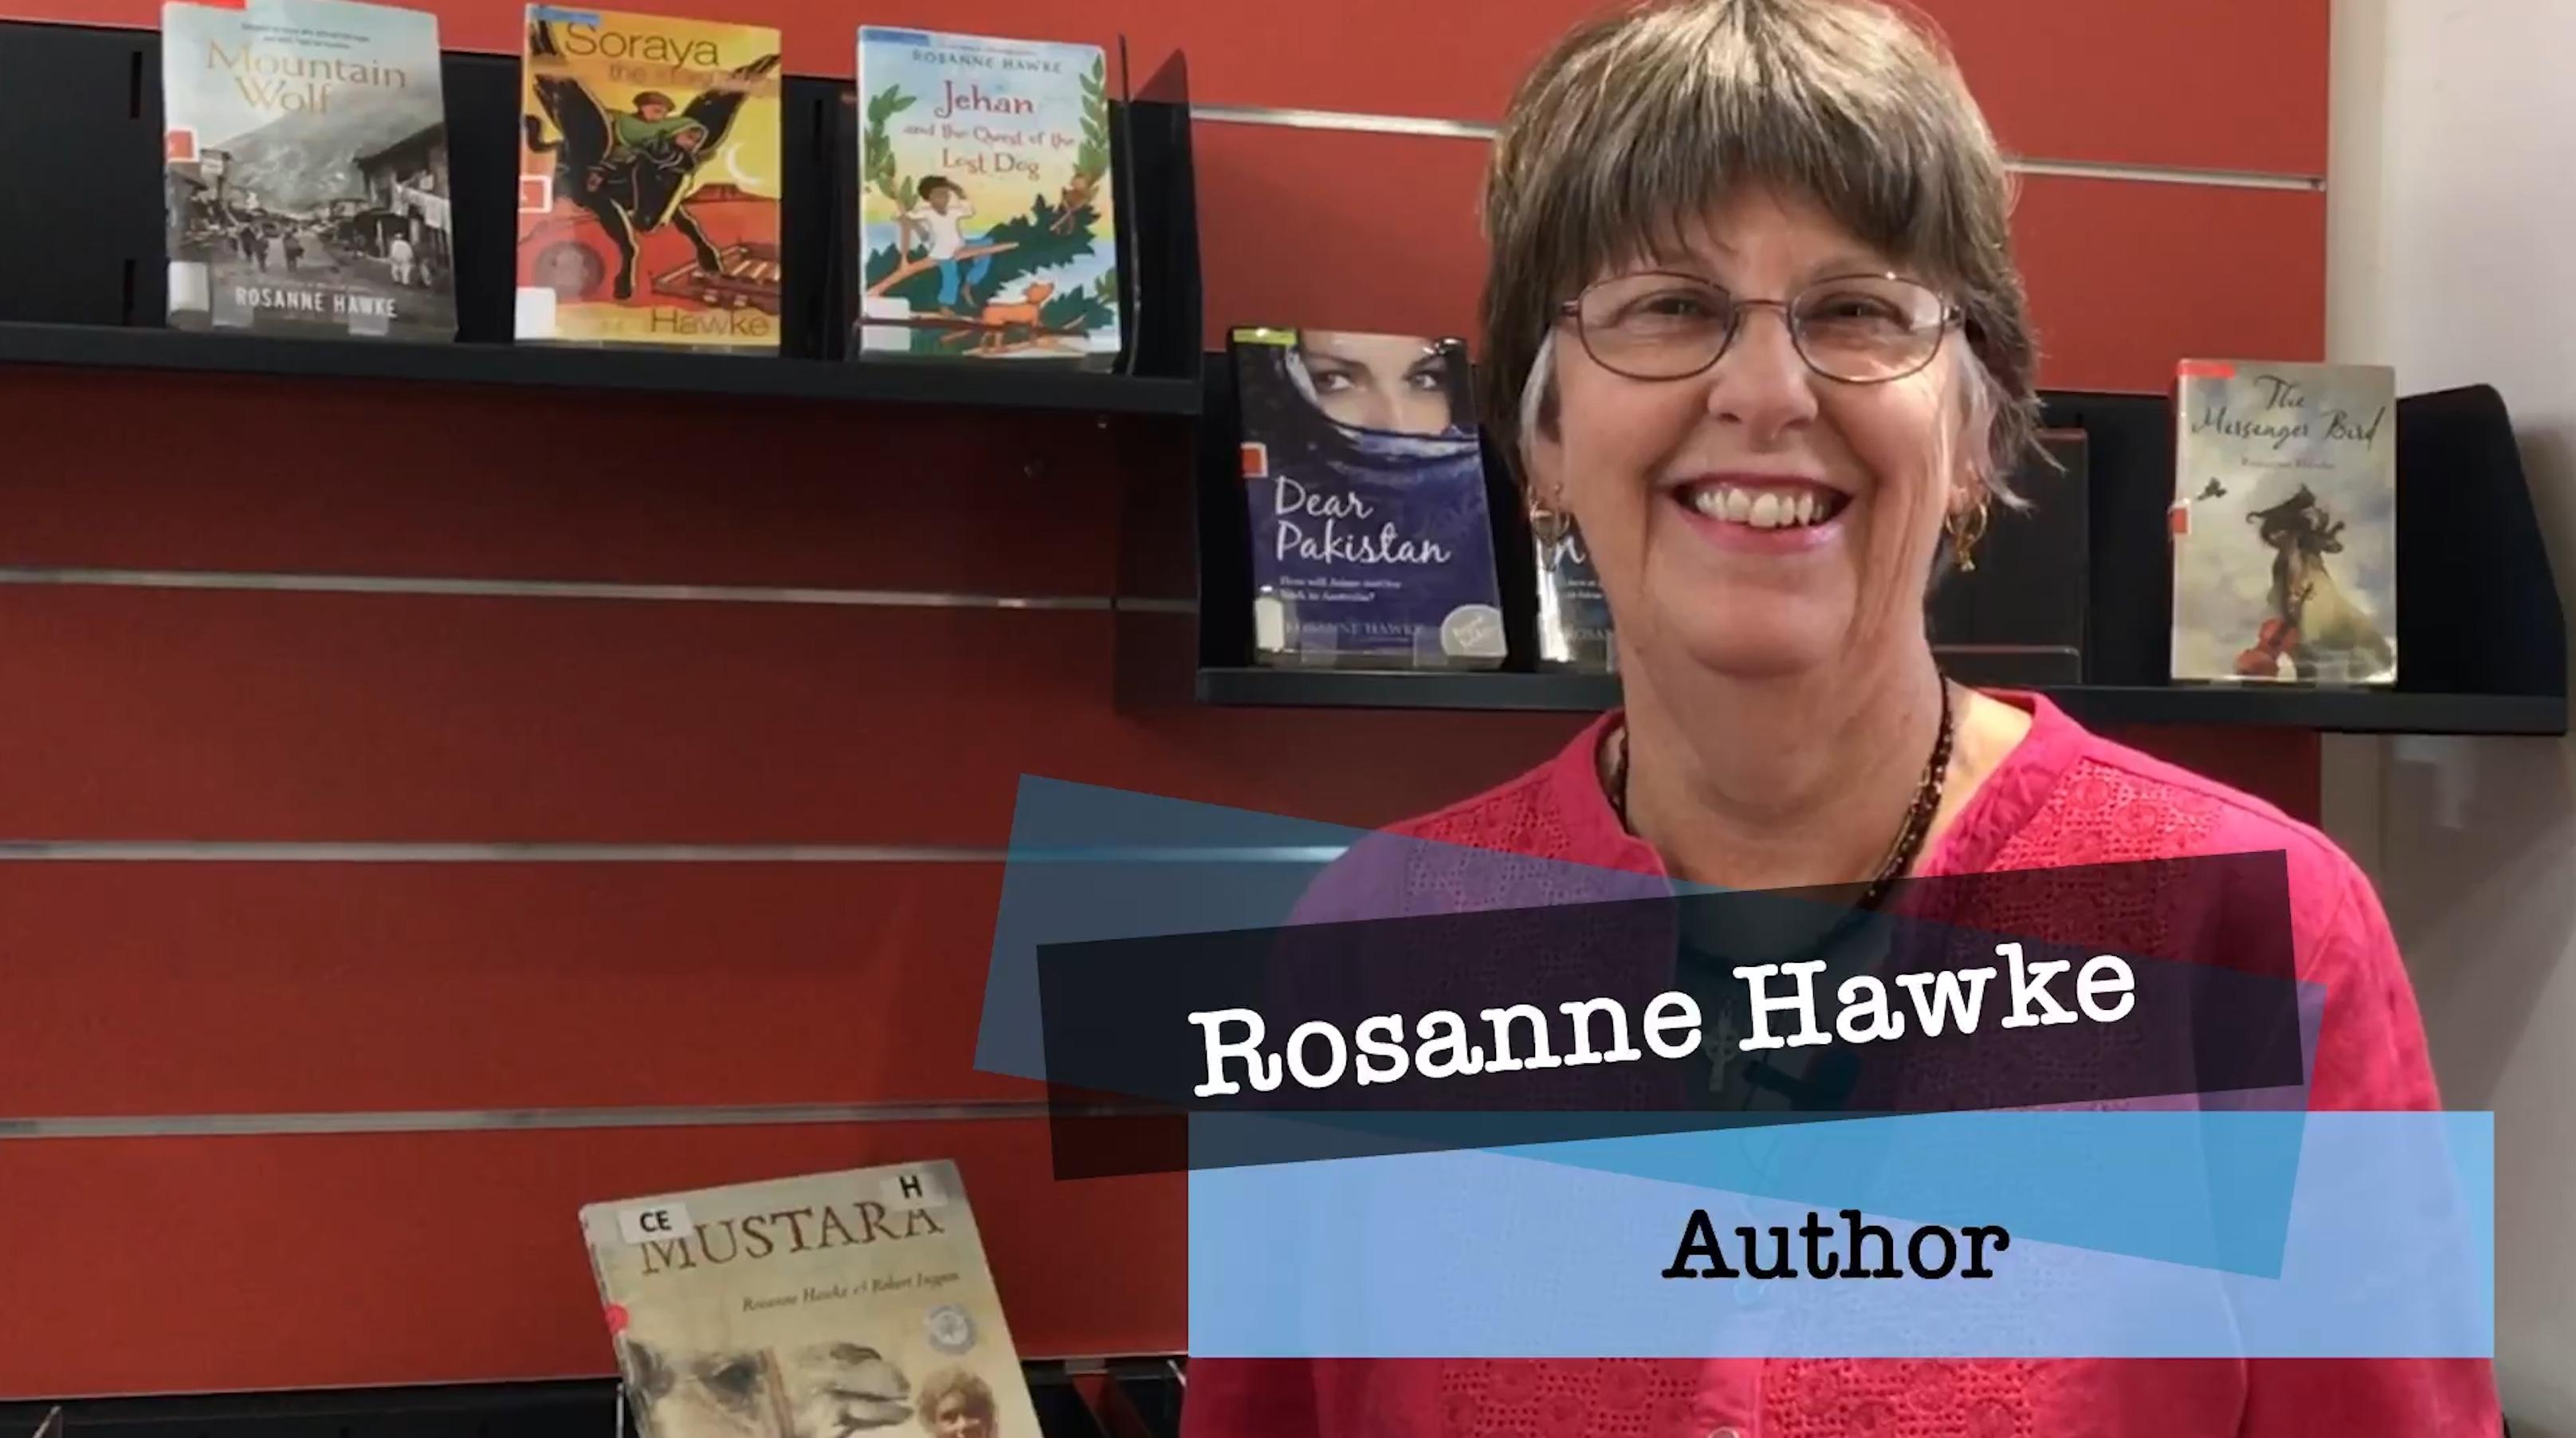 Rosanne Hawke